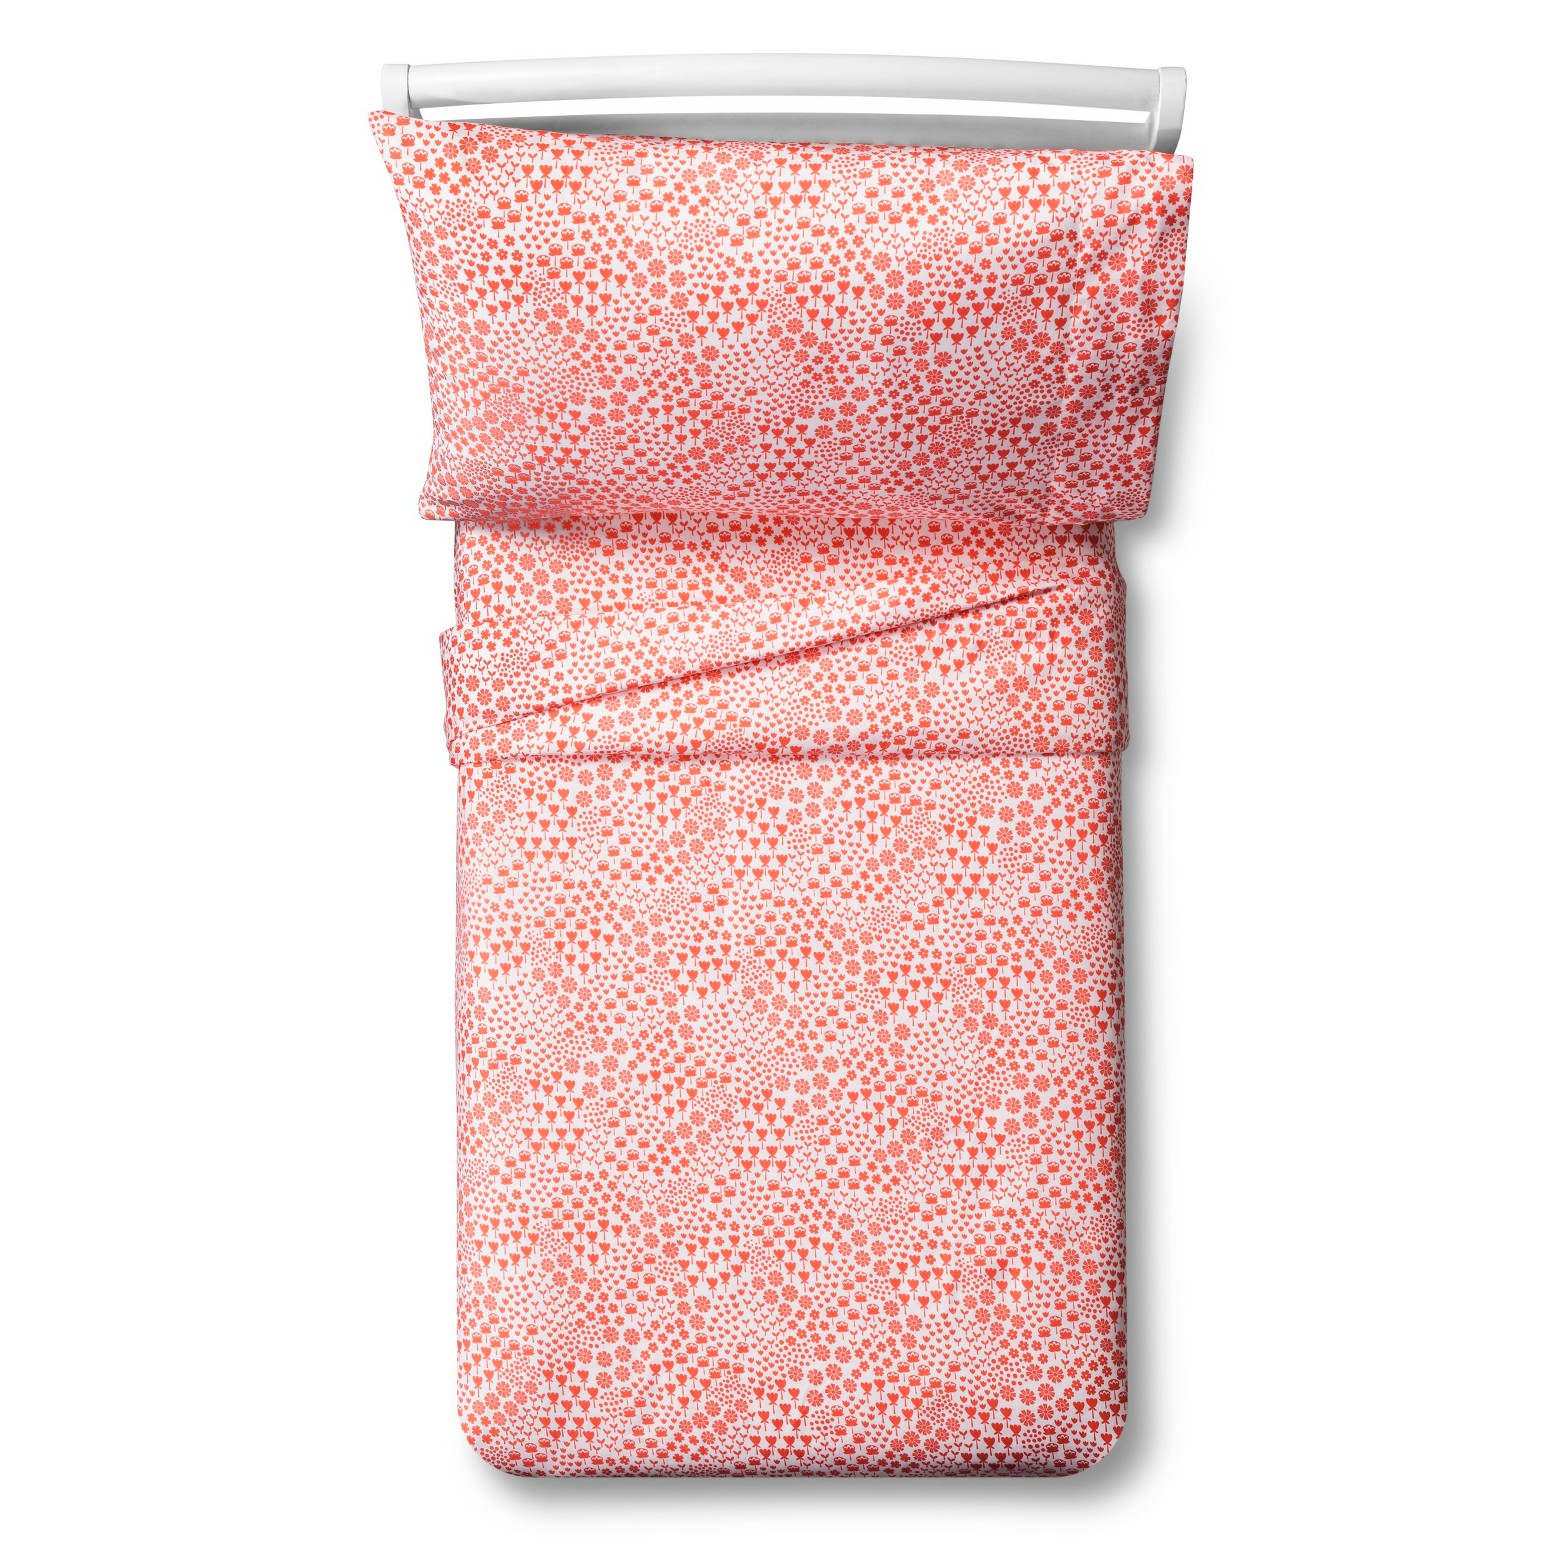 Fetching Florals Sheet Set - Toddler - 3 pc - Coral - Pillowfort™ : Target